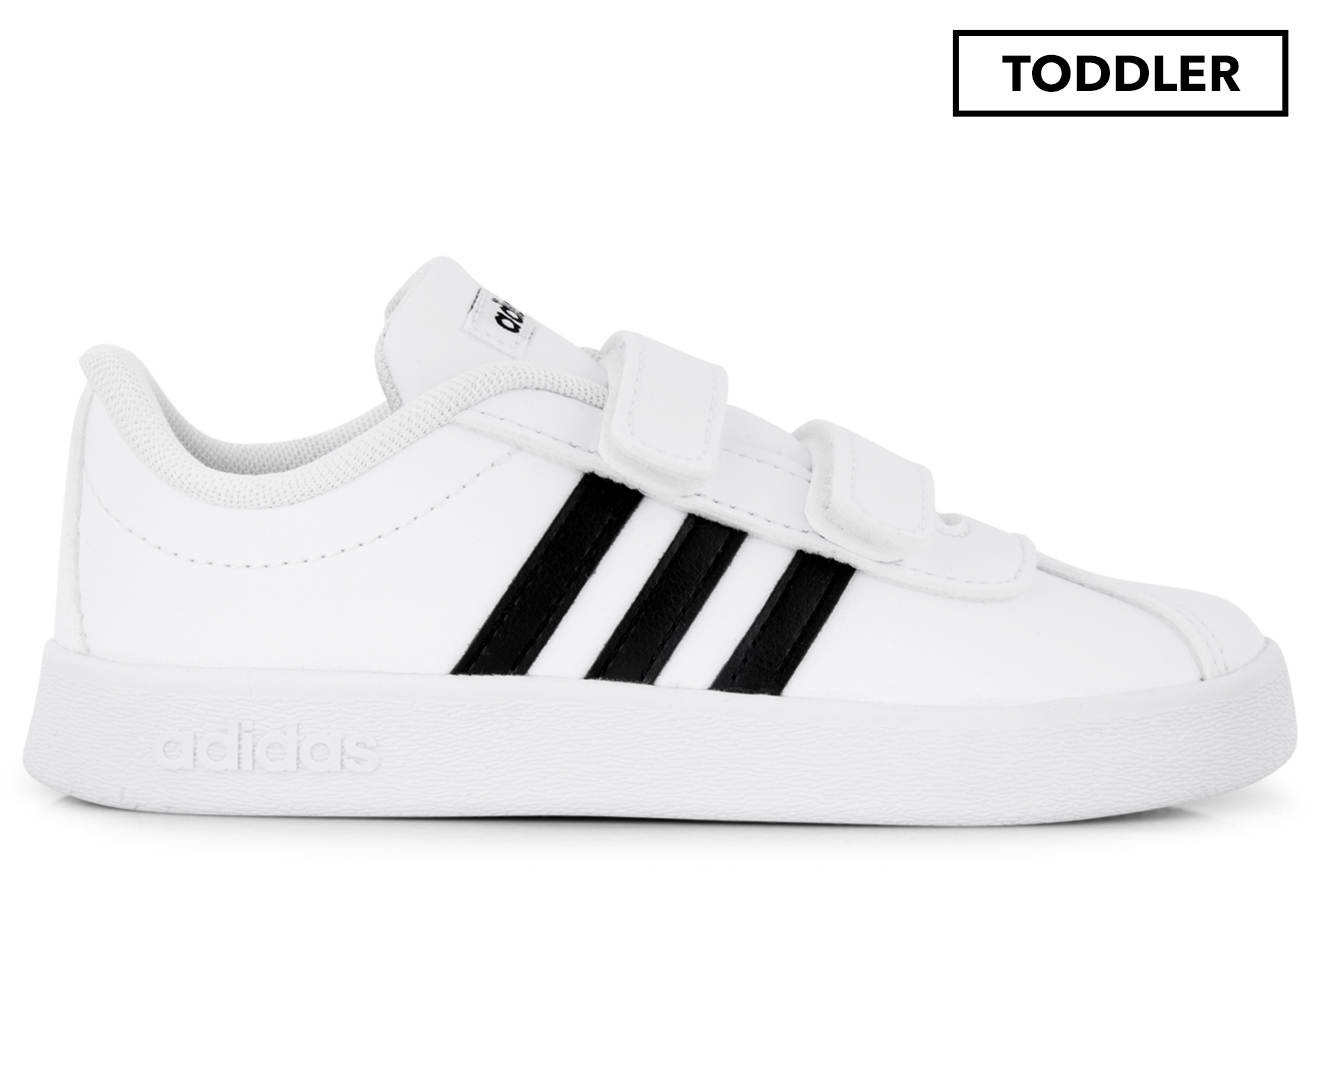 4d3120ea Details about Adidas Toddler VL Court 2.0 CMF I Shoe - Flat White/Core Black